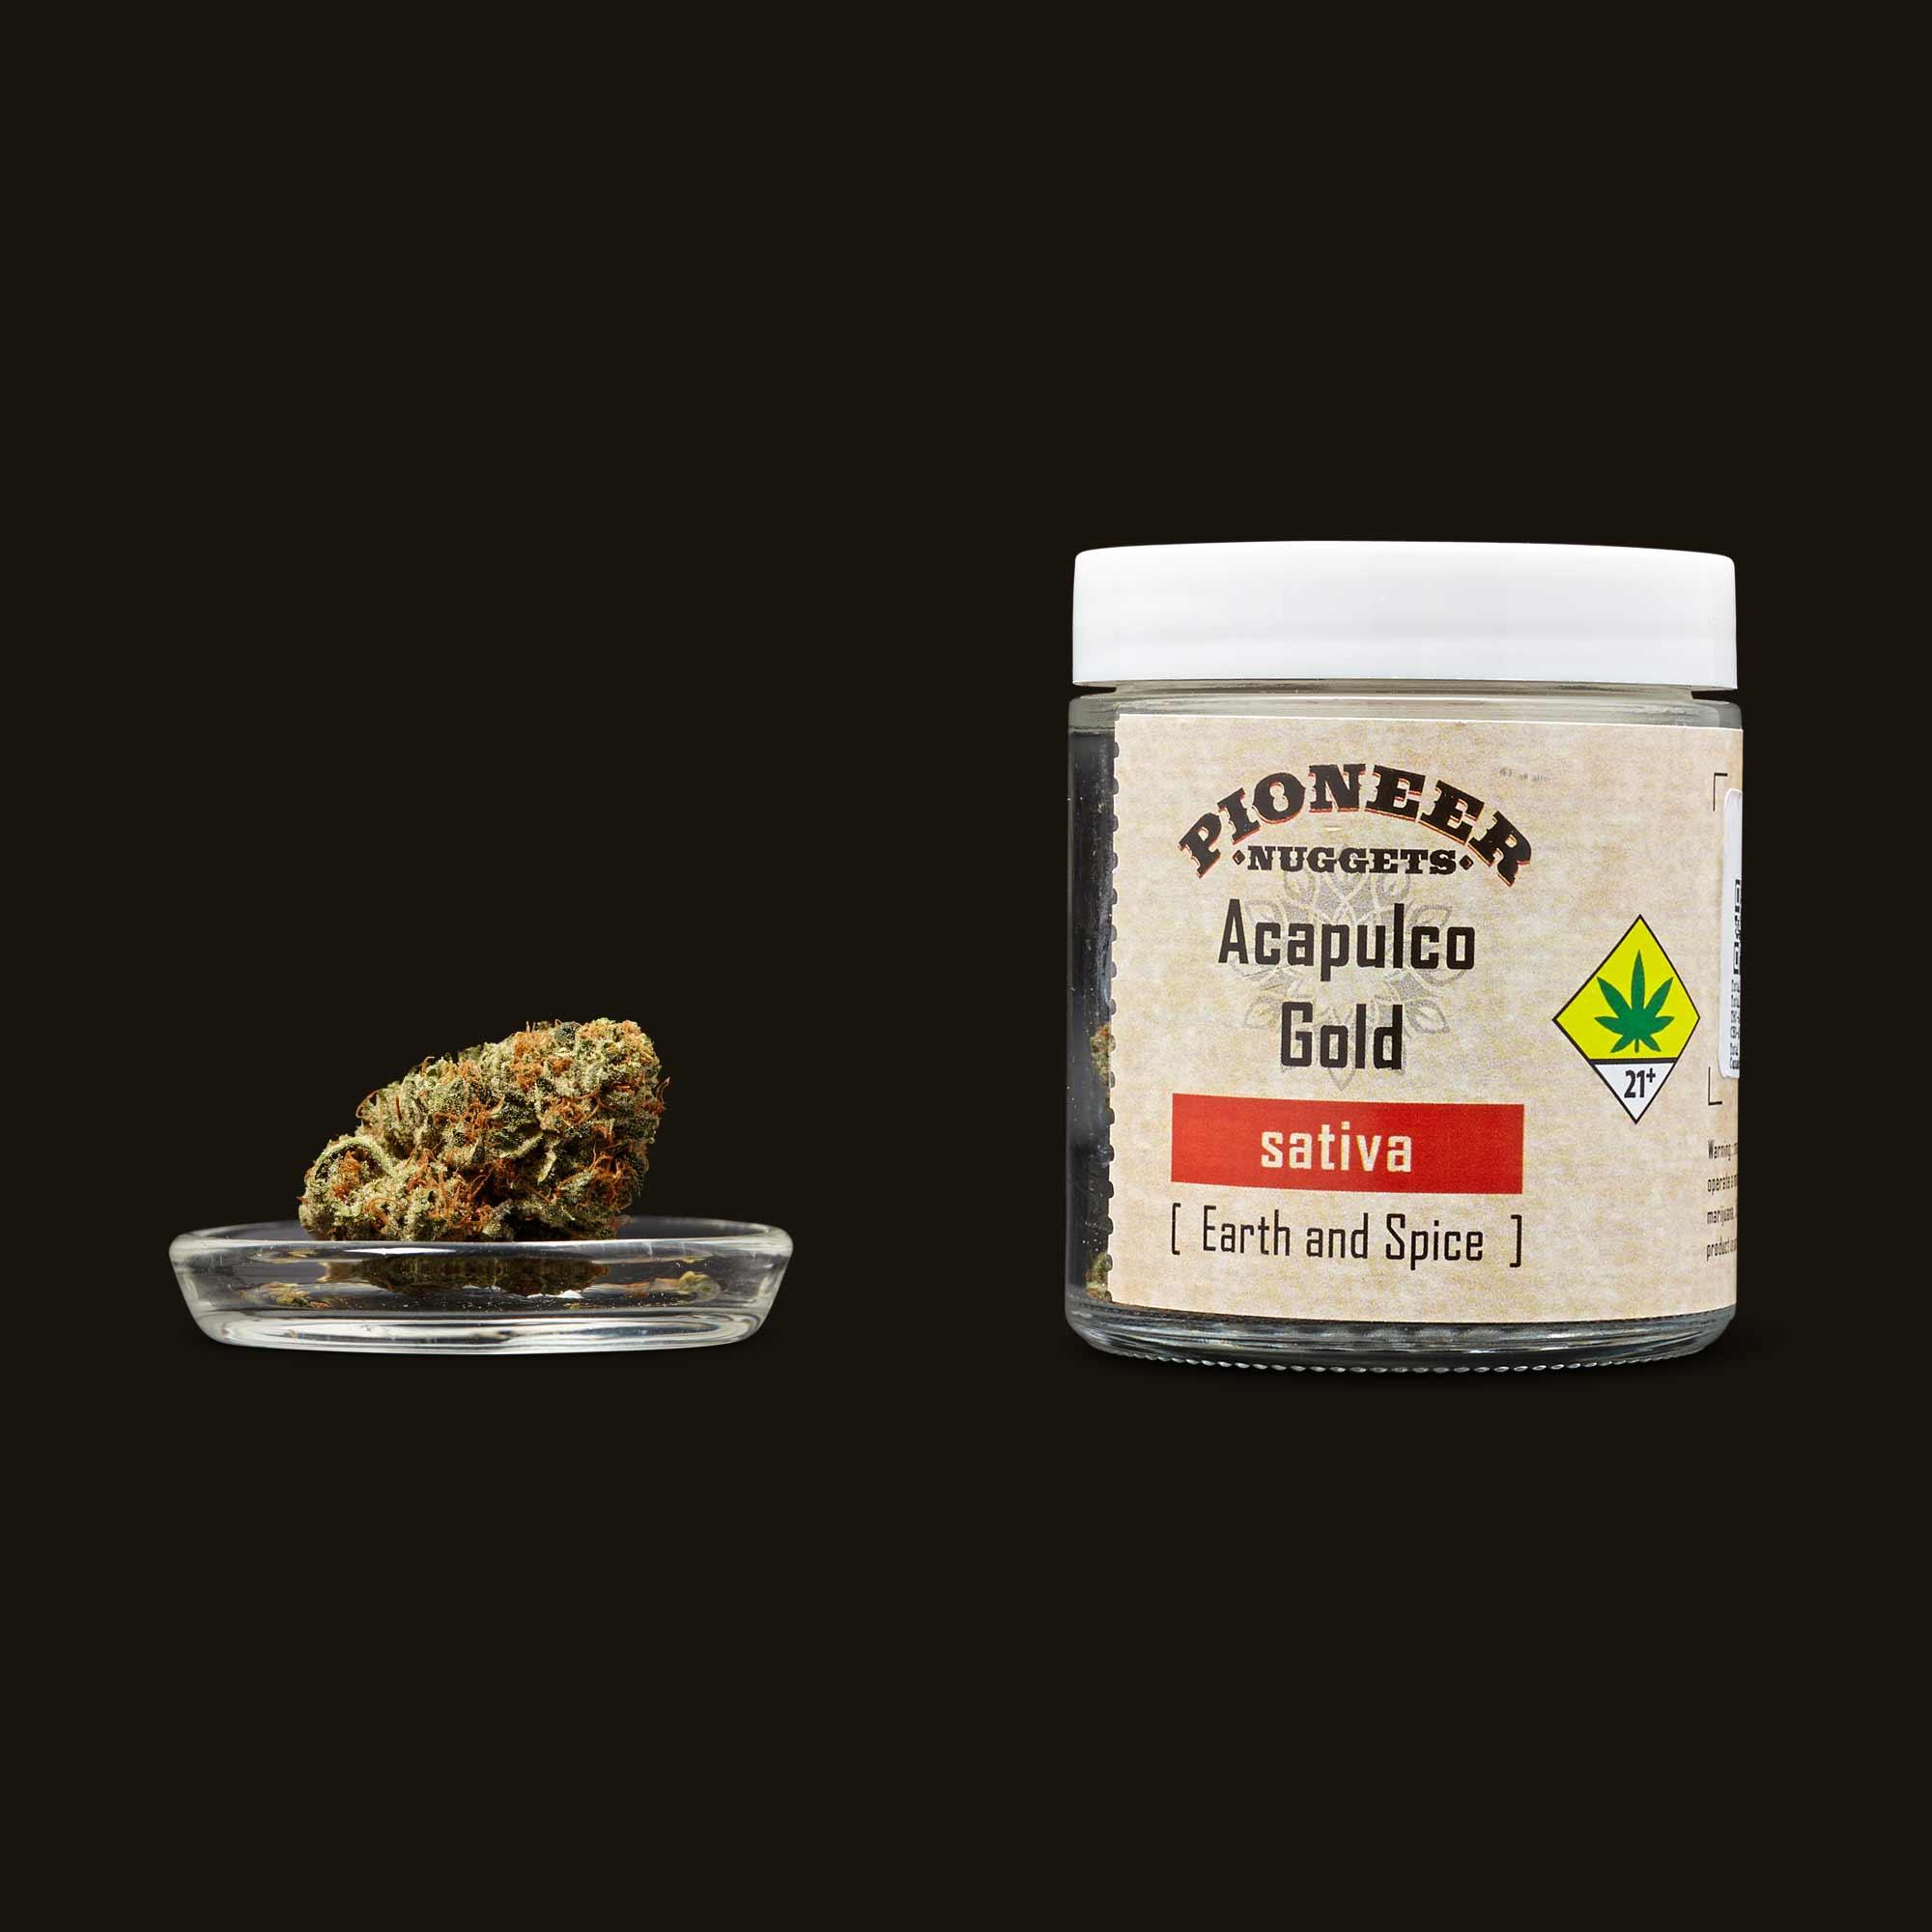 Pioneer Nuggets Acapulco Gold